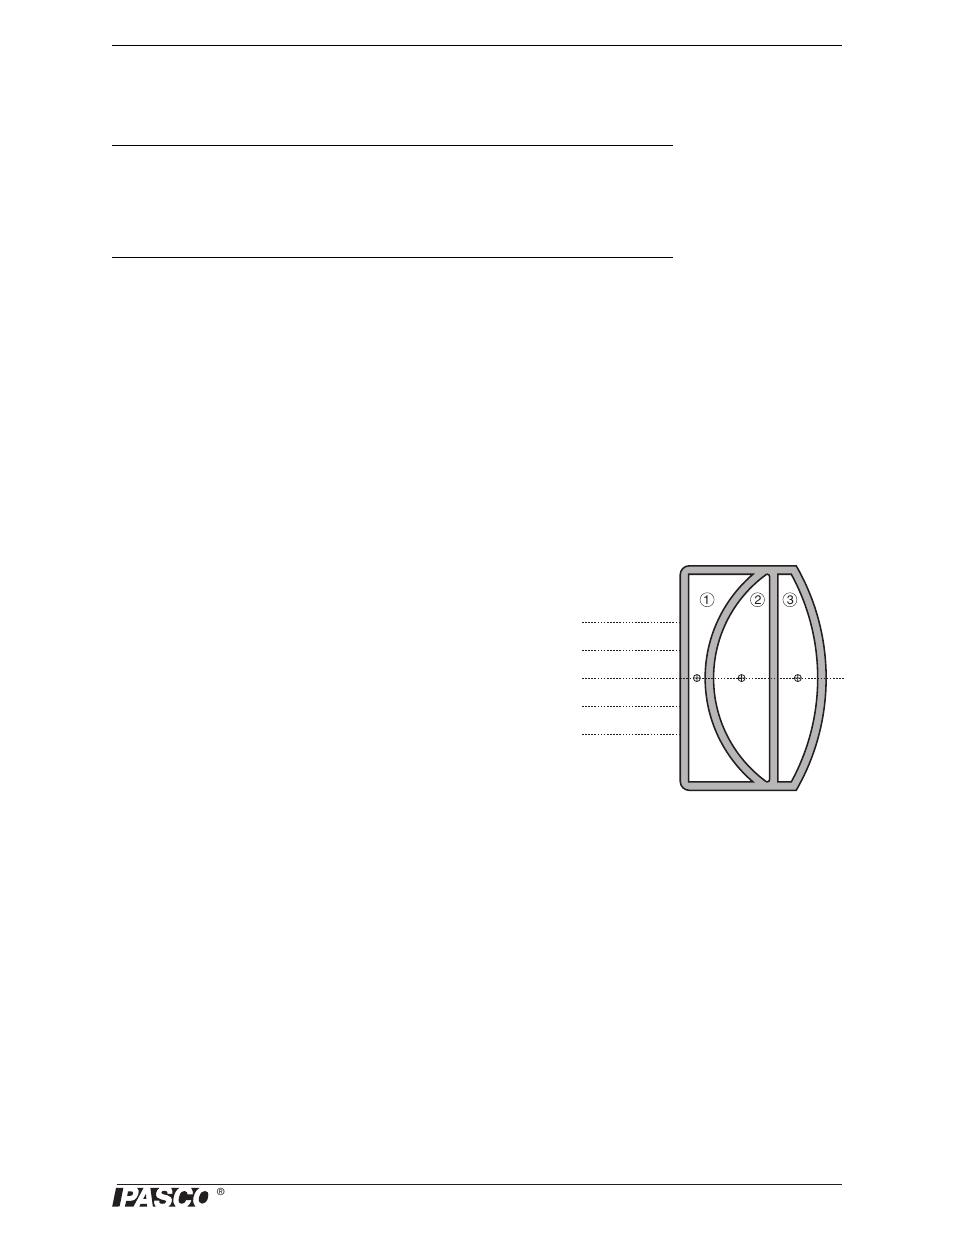 Experiment 7: hollow lens, Purpose, Background | PASCO OS-8459